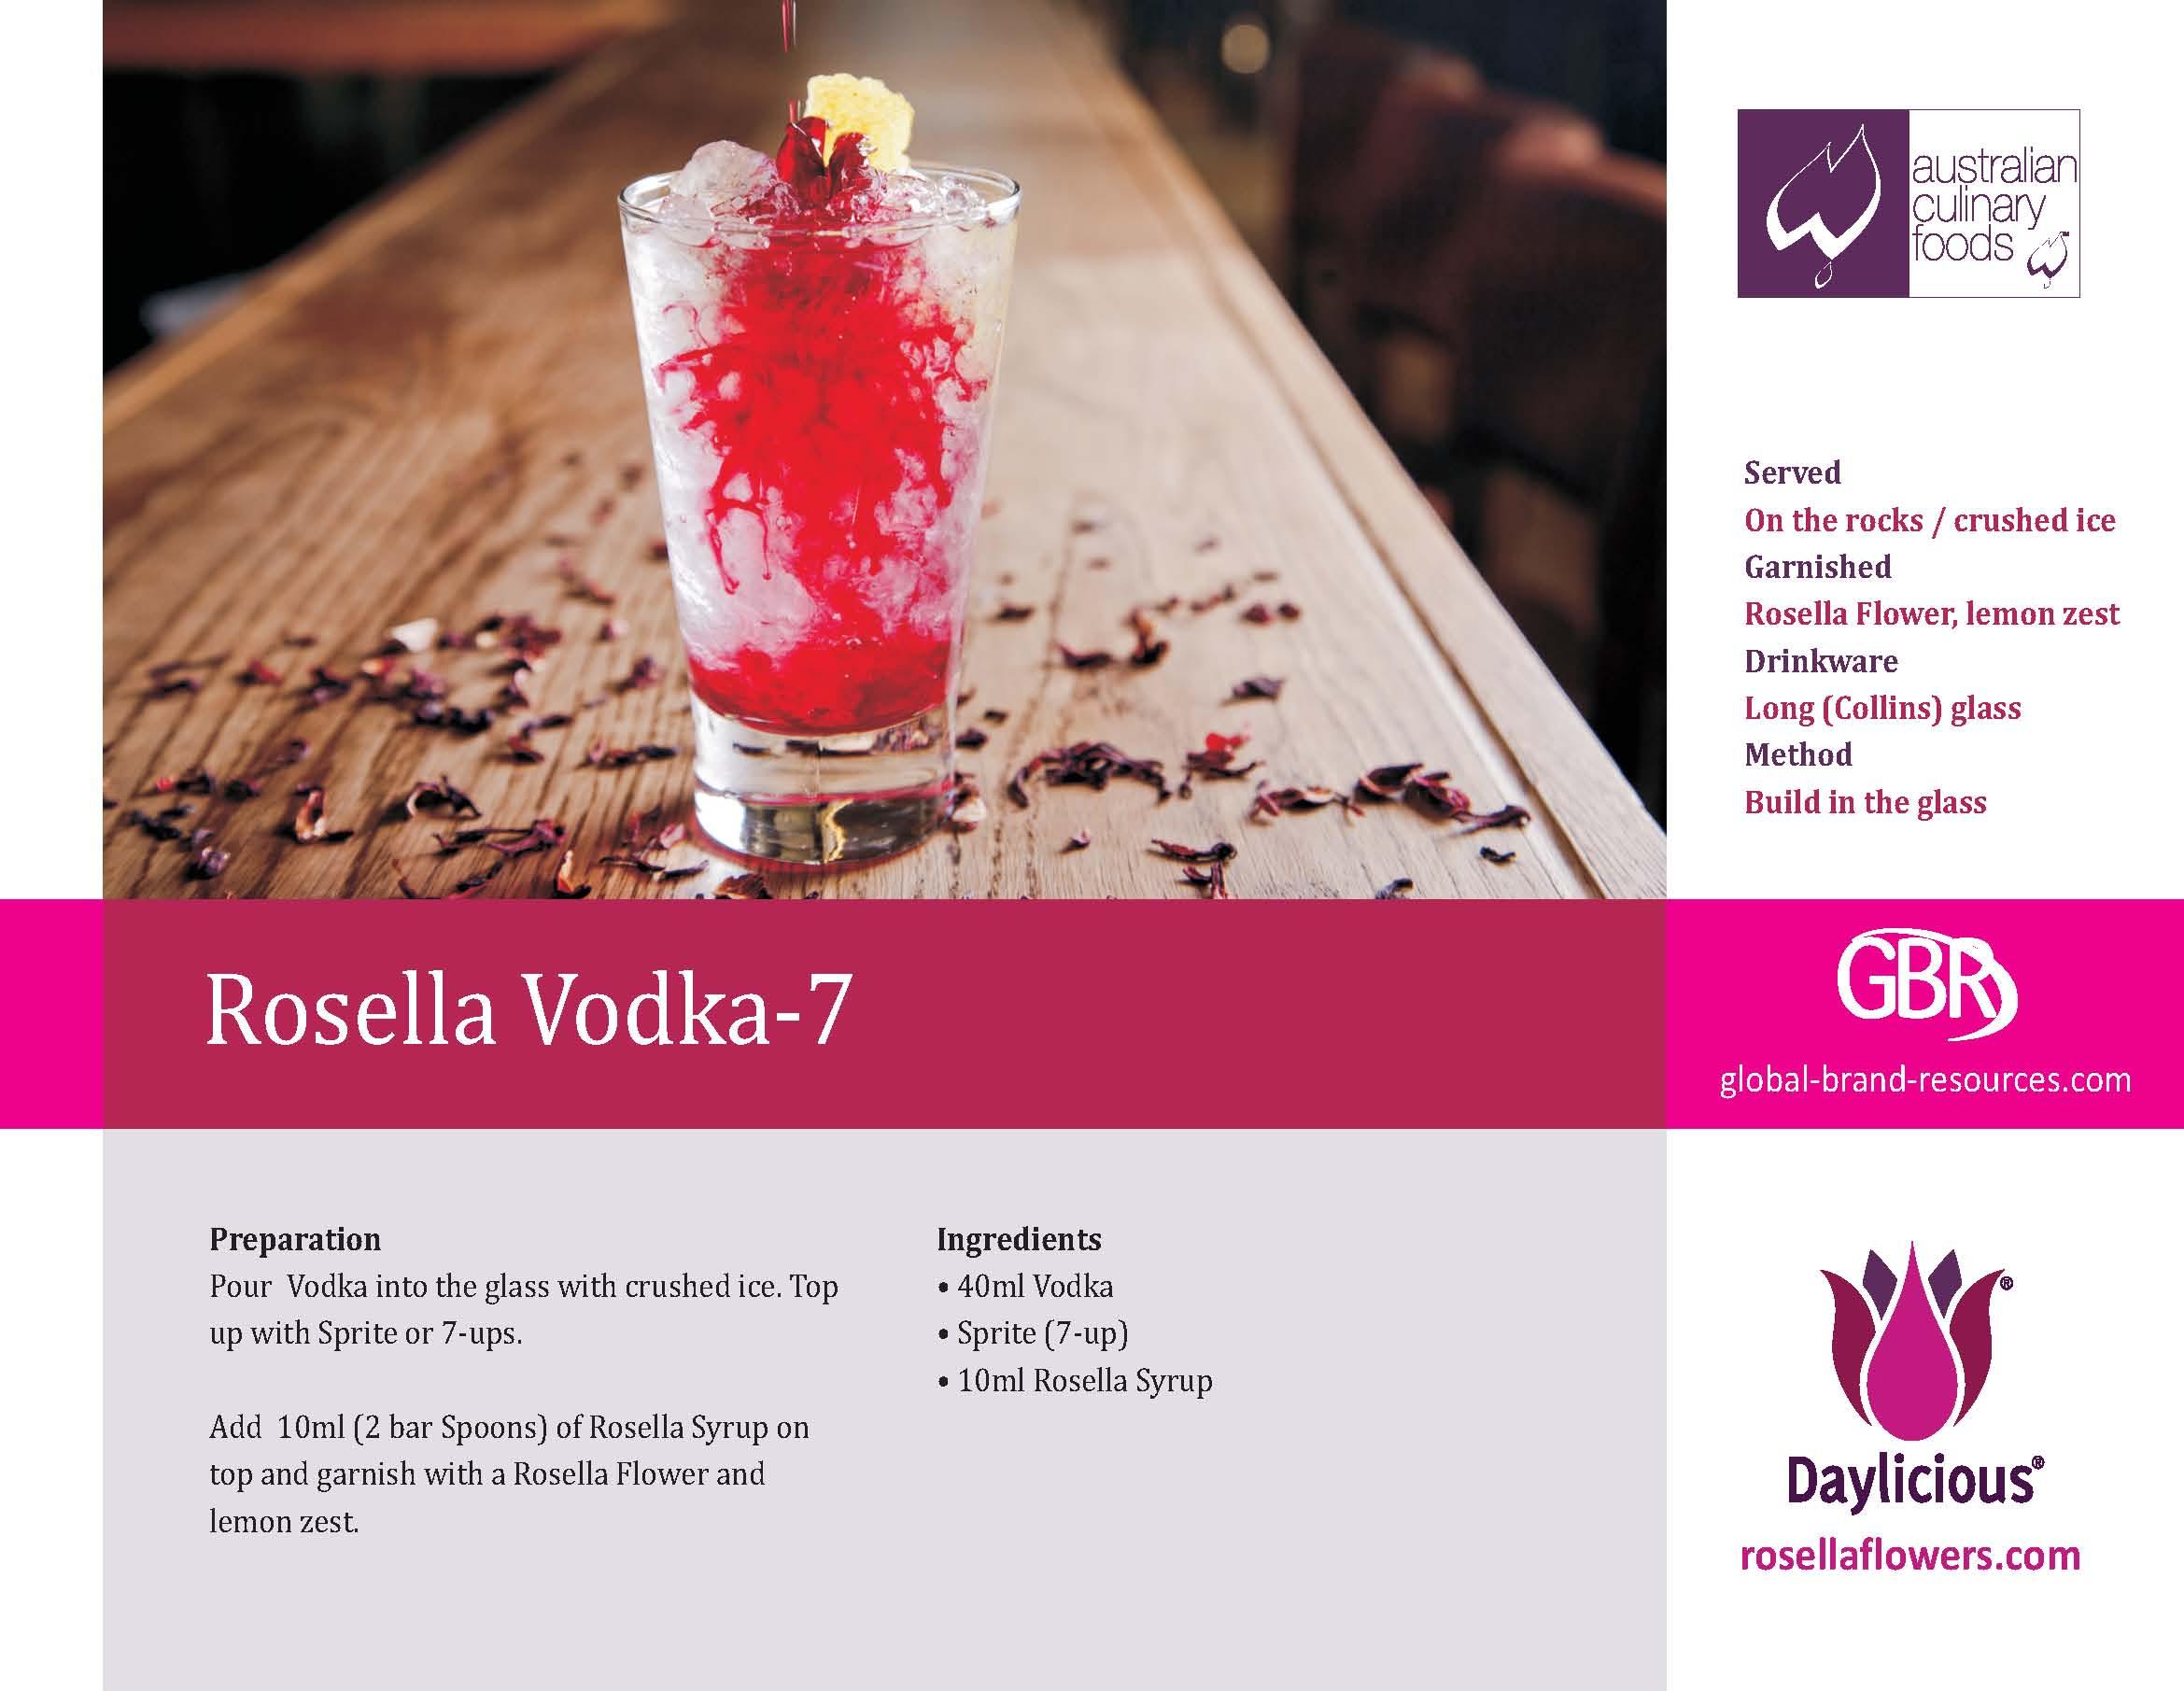 Rosella Vodka-7